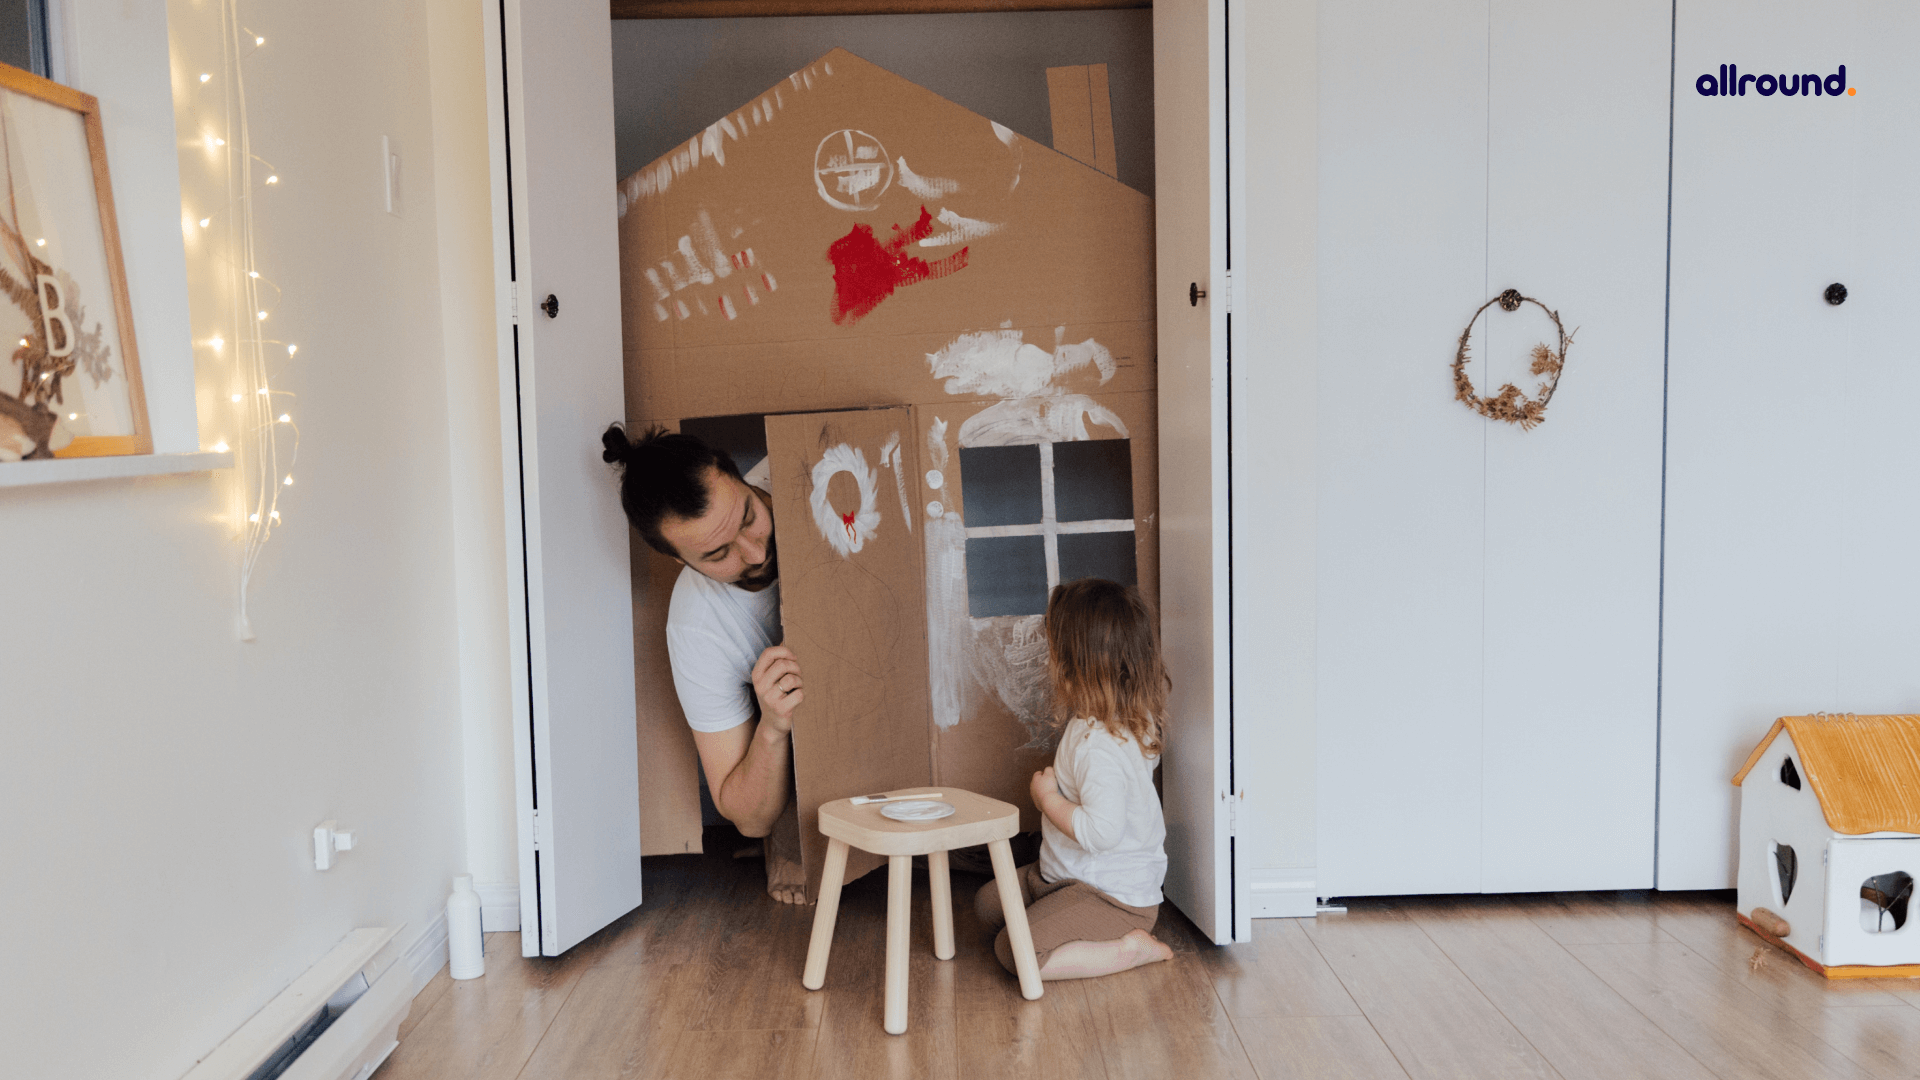 15 Incredible Cardboard Craft Activities You Cannot Resist Creating